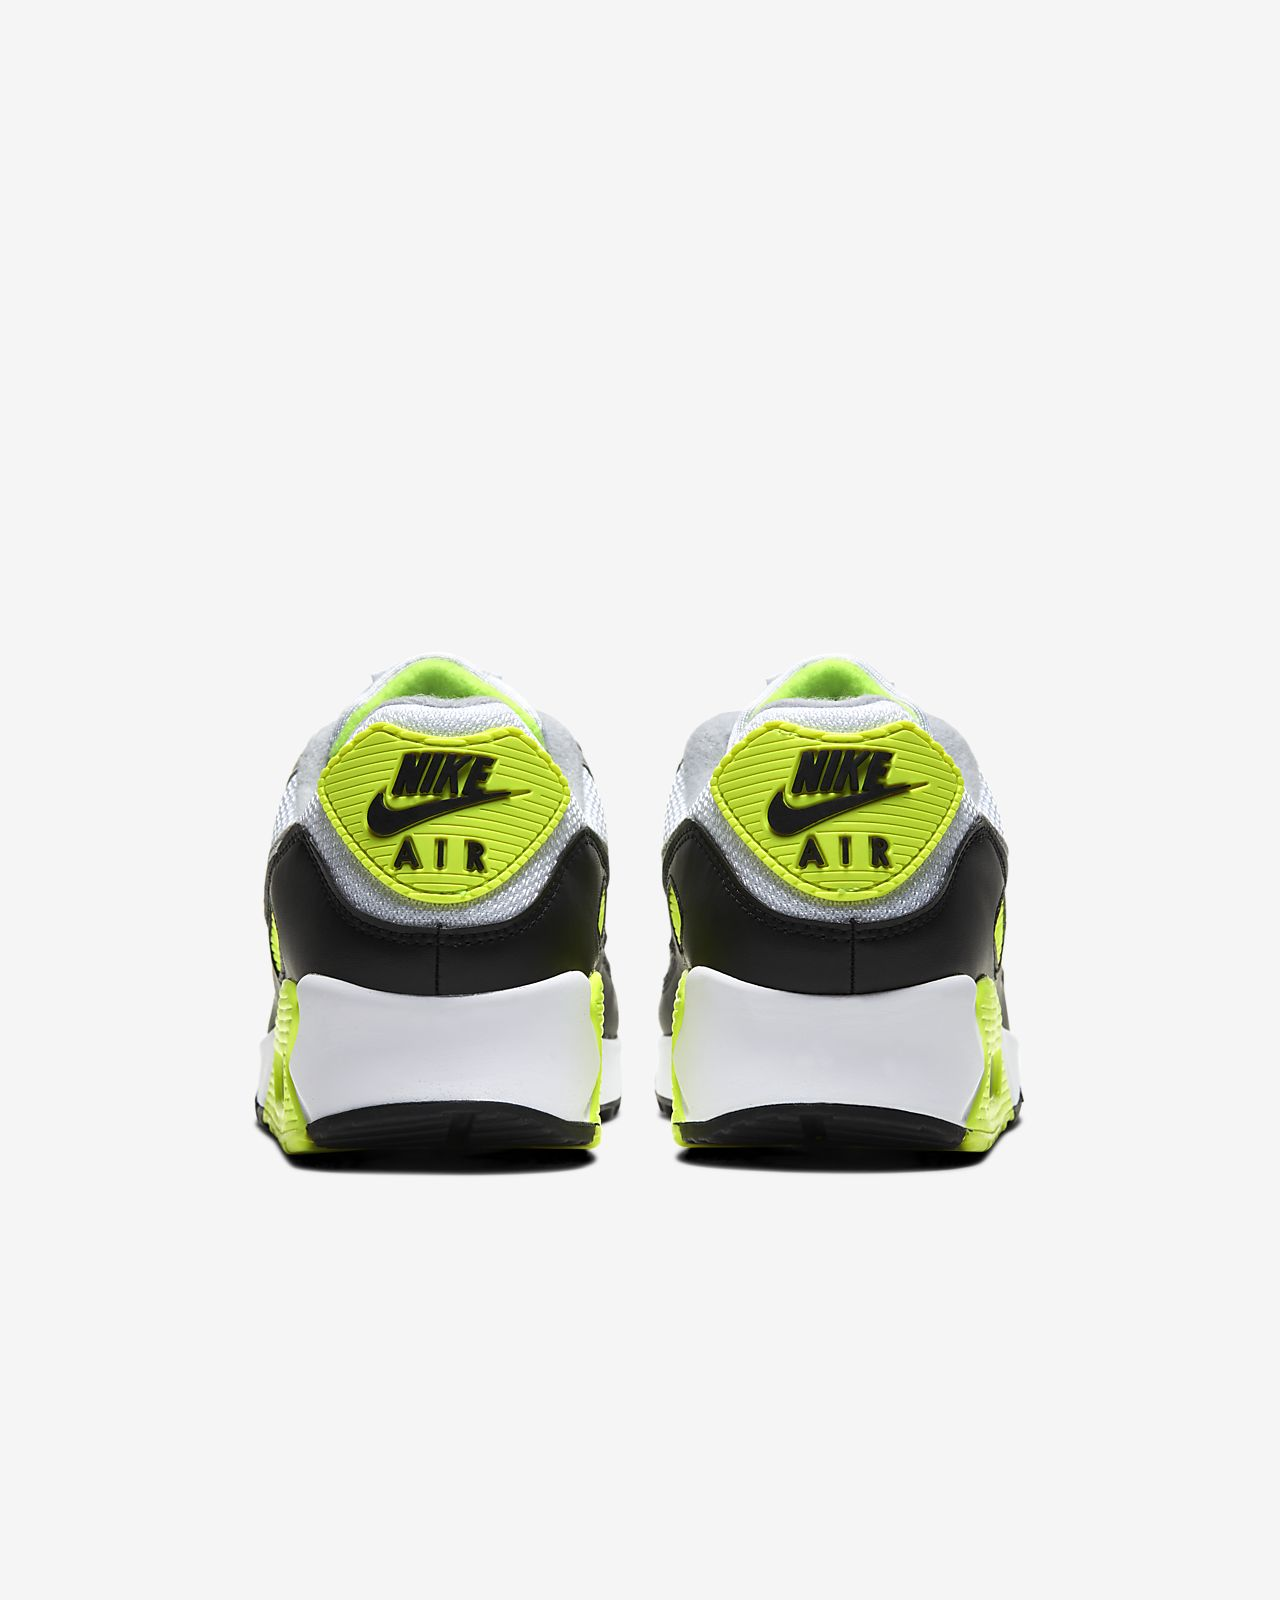 Nike Men's Air Max 90 OG Volt Green White Particle Grey Black 2020 CD0881 103